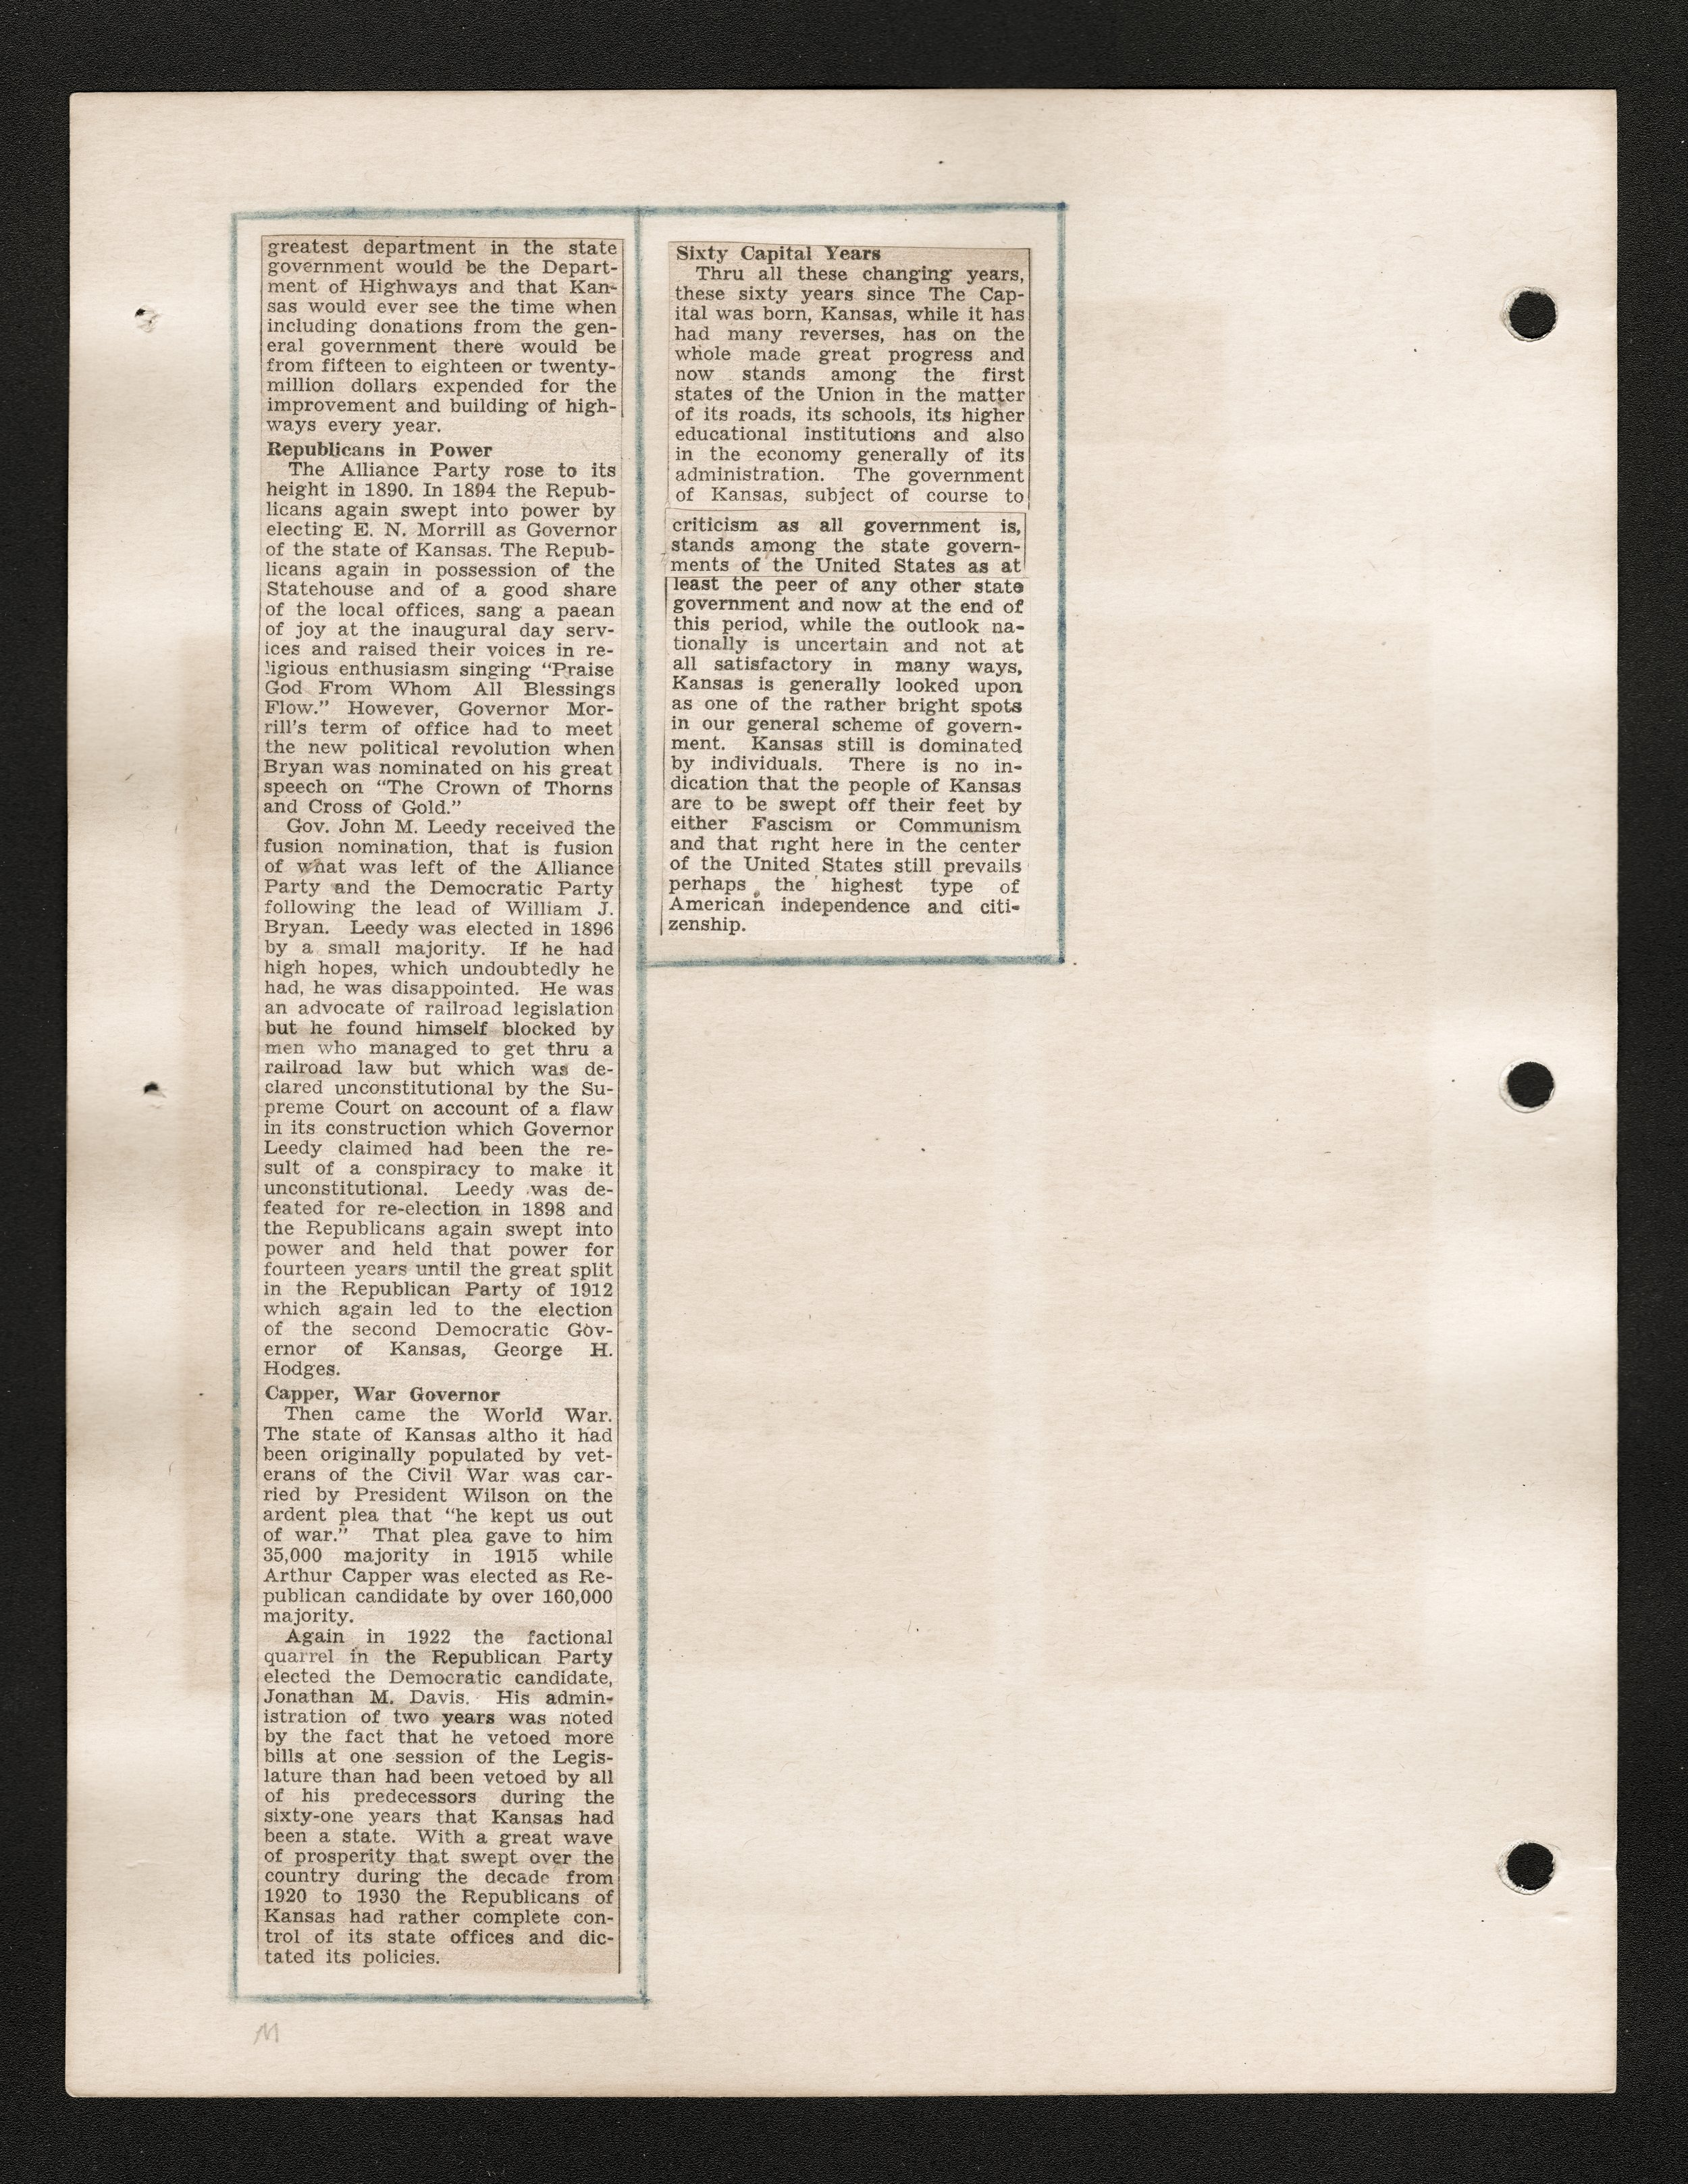 Maude Mitchell scrapbook - Newspaper clipping: